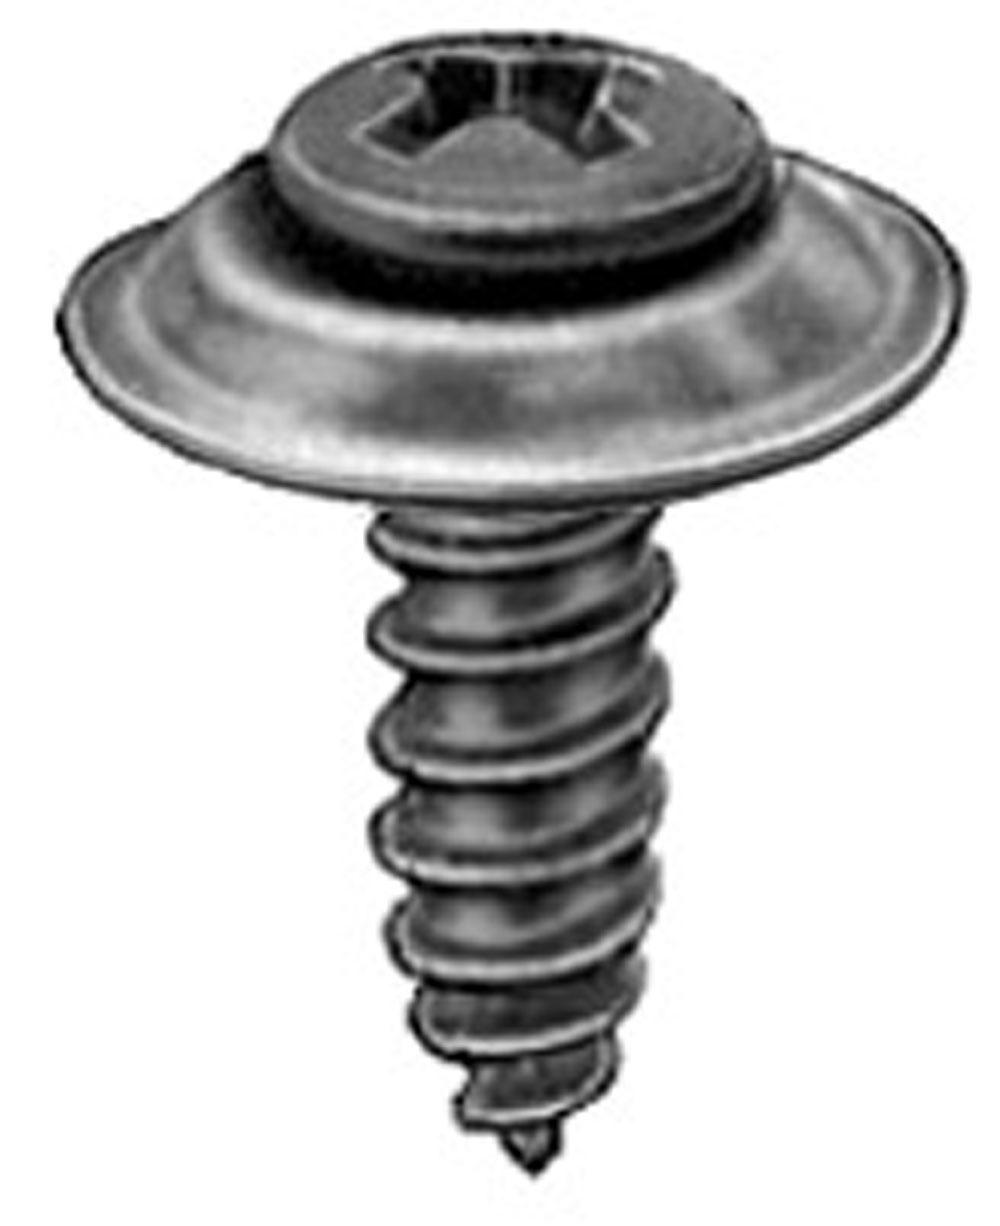 #14 X 3//4 Hex Head Zinc Tag Screws Clipsandfasteners Inc 500 License Plate Screws 1//4